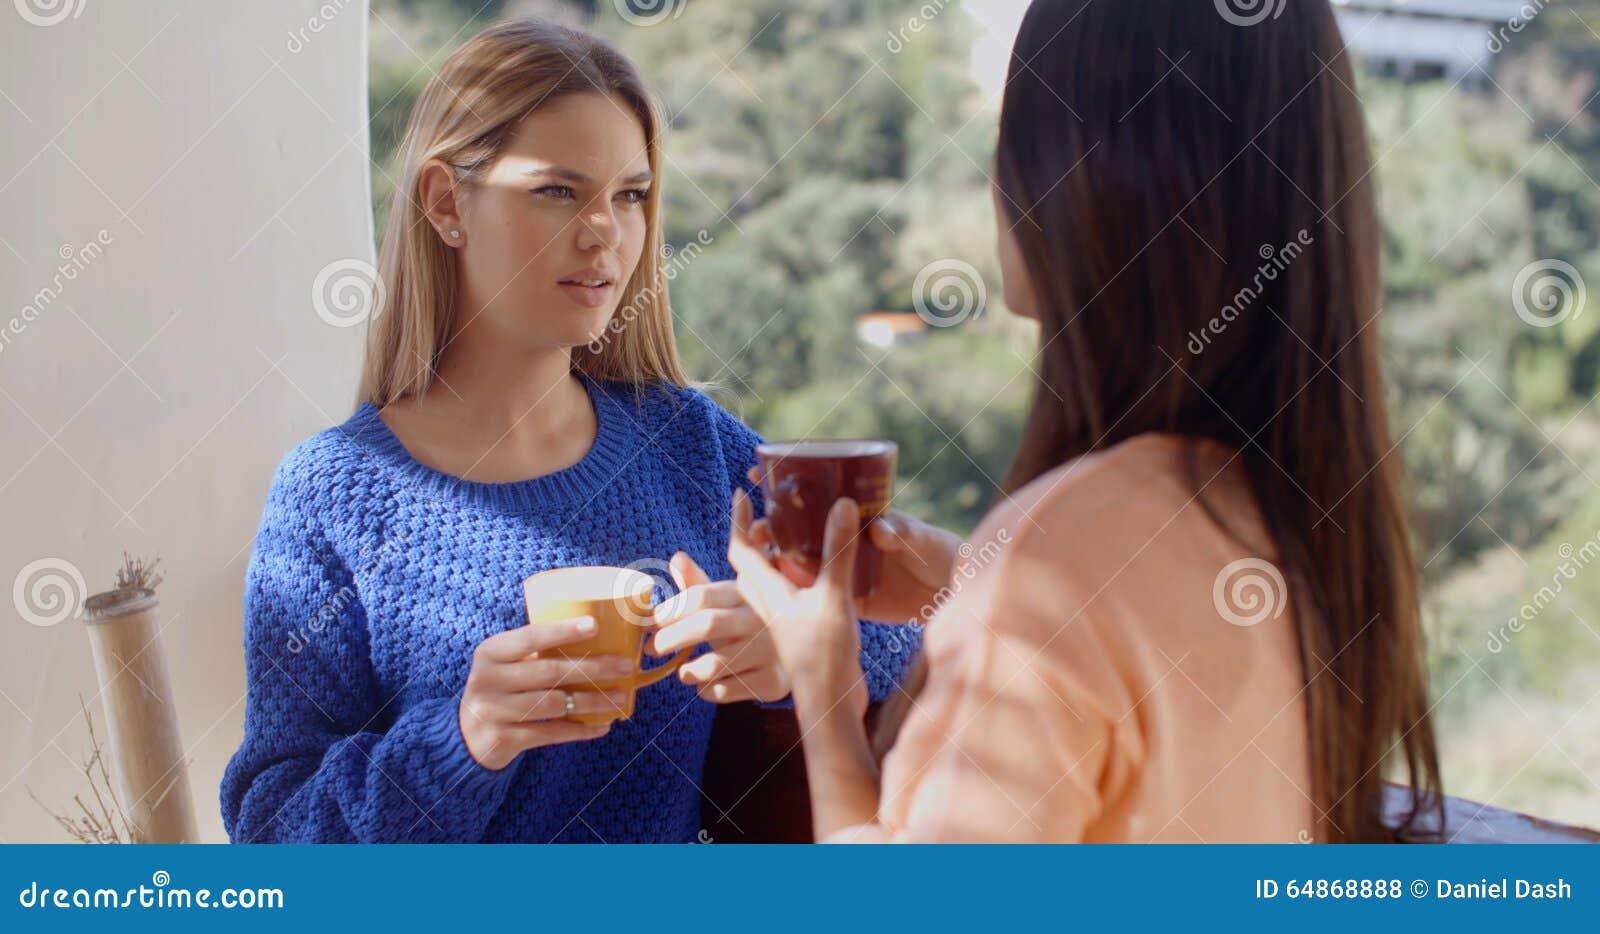 Two women having a friendly chat